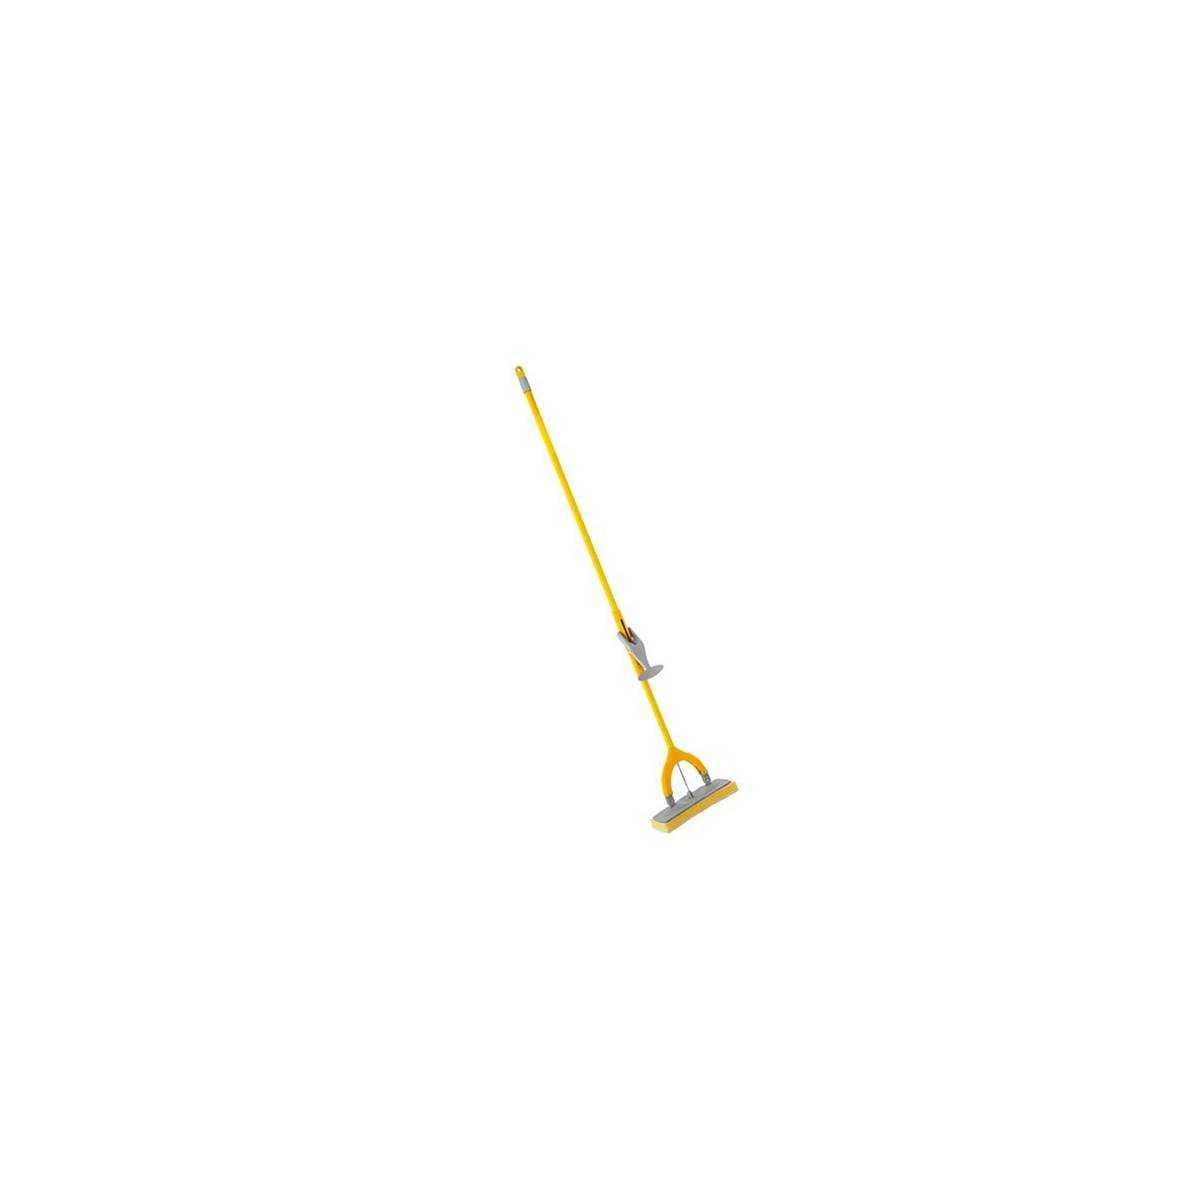 Швабра для сухой и влажной уборки Squizzo 10195 APEX - Fratelli Re SpA